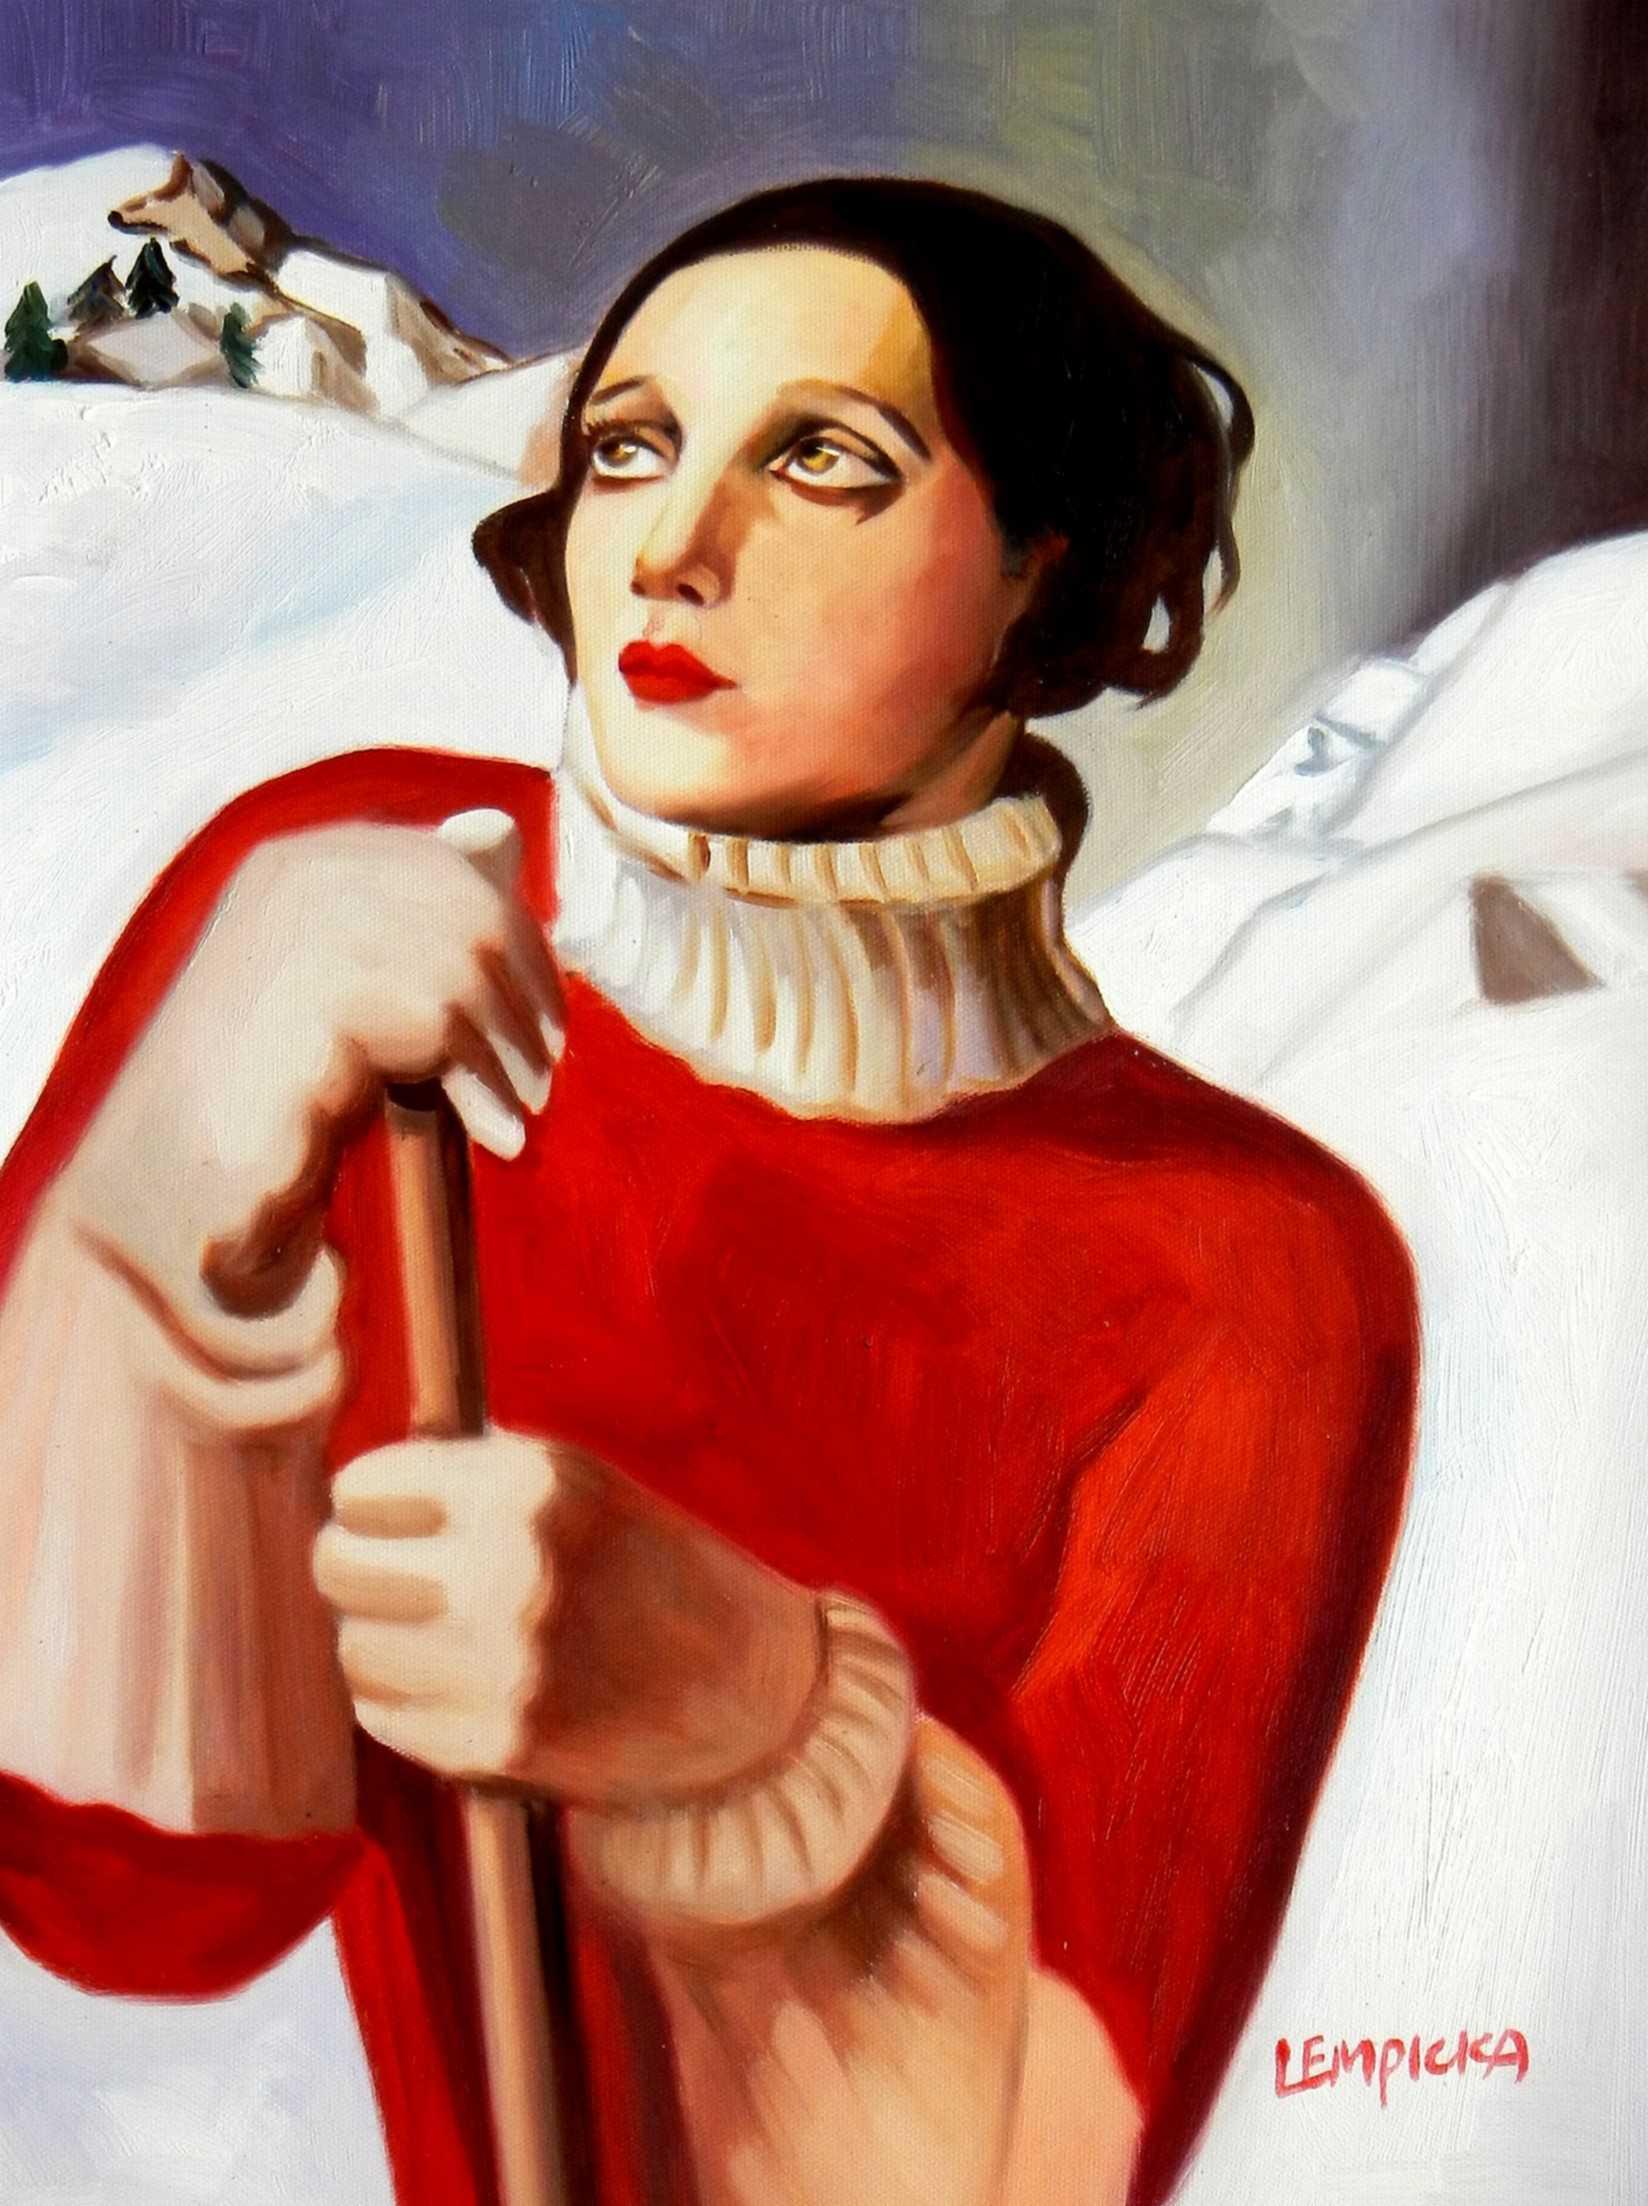 Homage to T. Lempicka - Sain Moritz a95725 30x40cm handgemaltes Gemälde